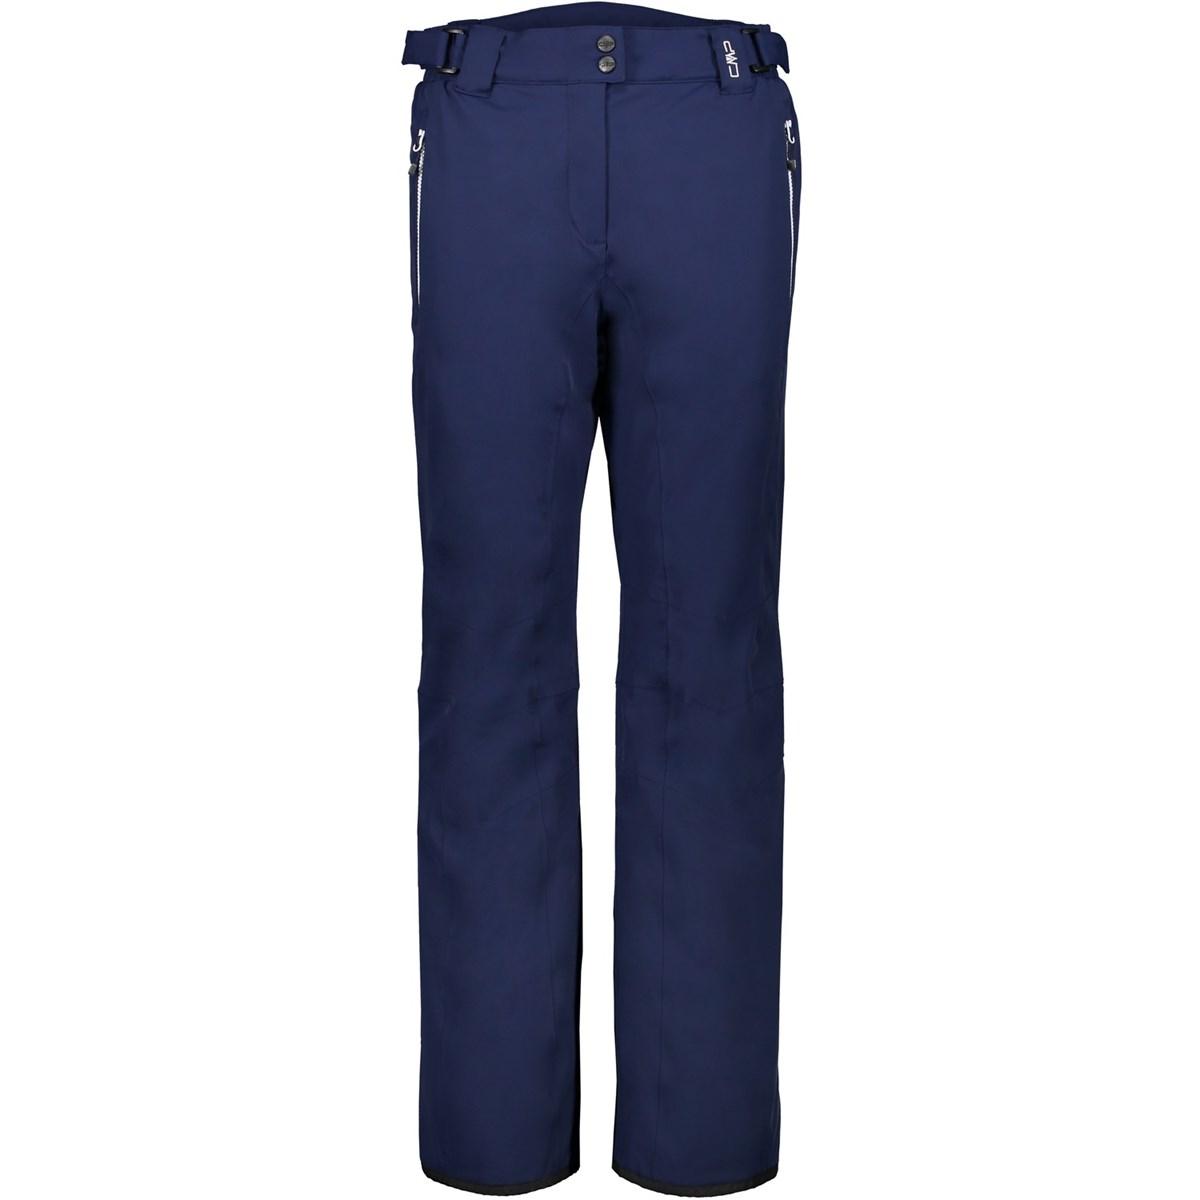 CMP Eden Ladies stretch insulated ski pants Navy blue £100.00 3b71481ff